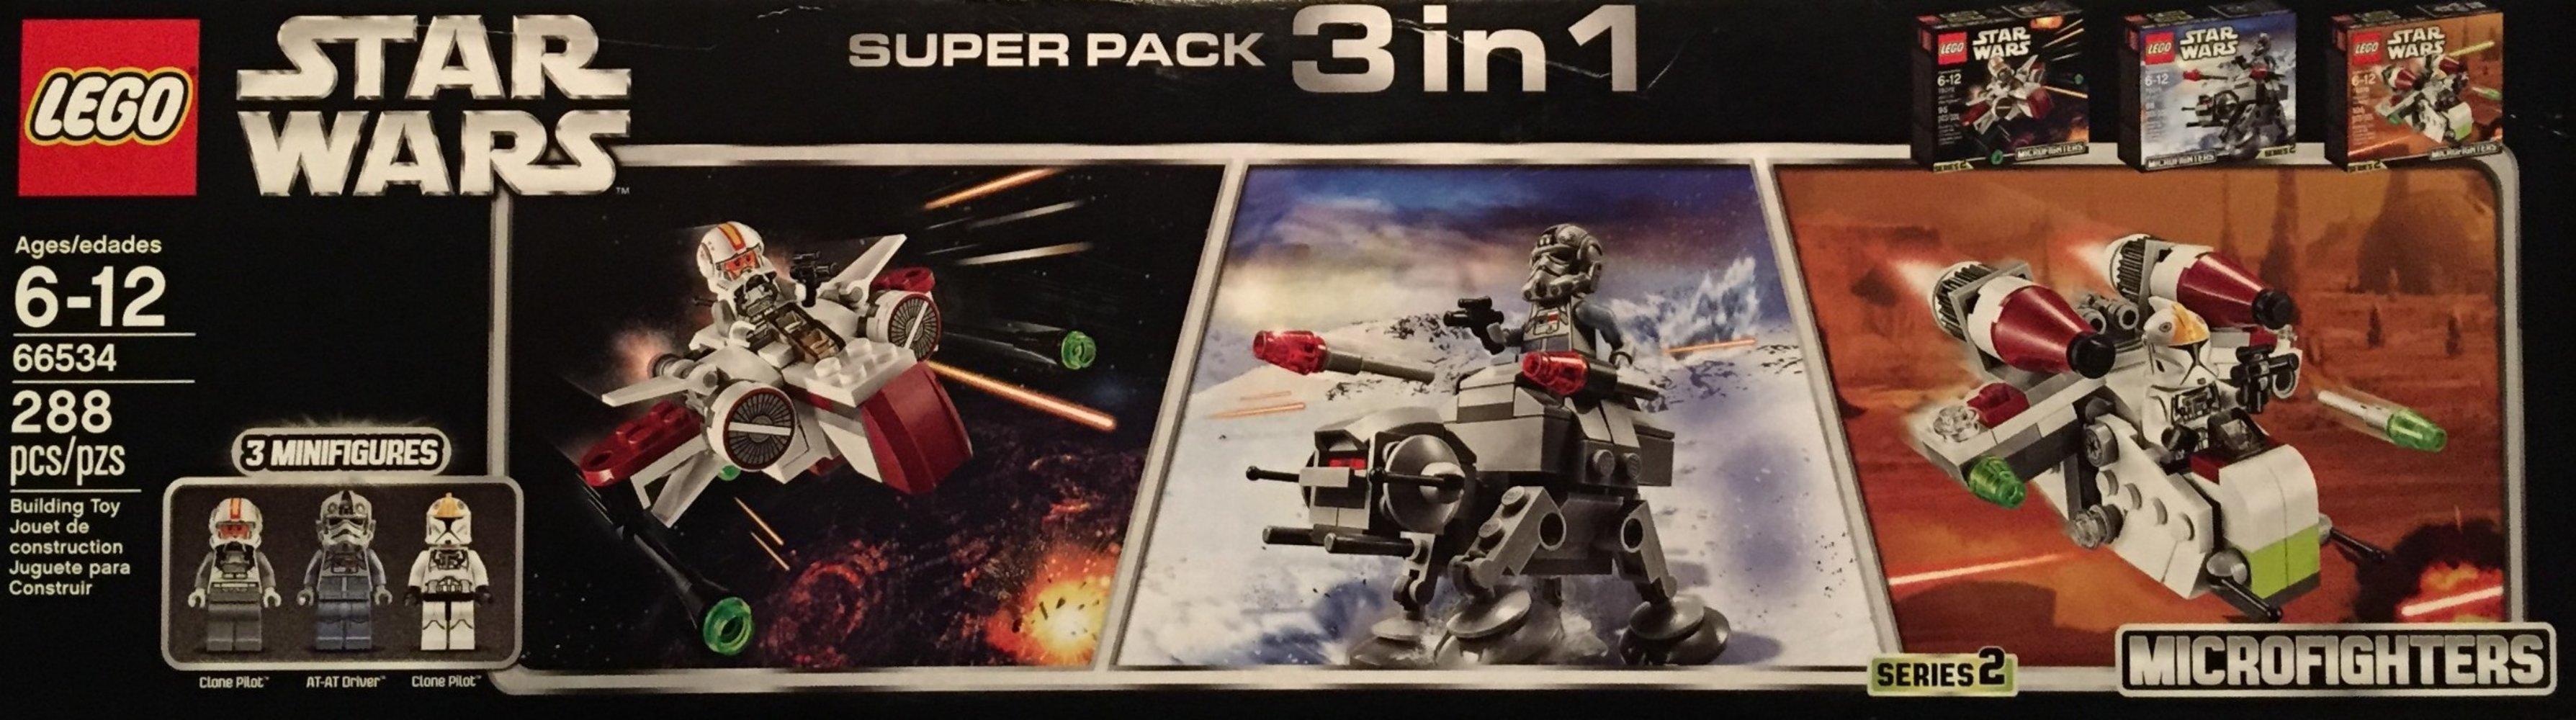 Star Wars Super Pack 3 in 1